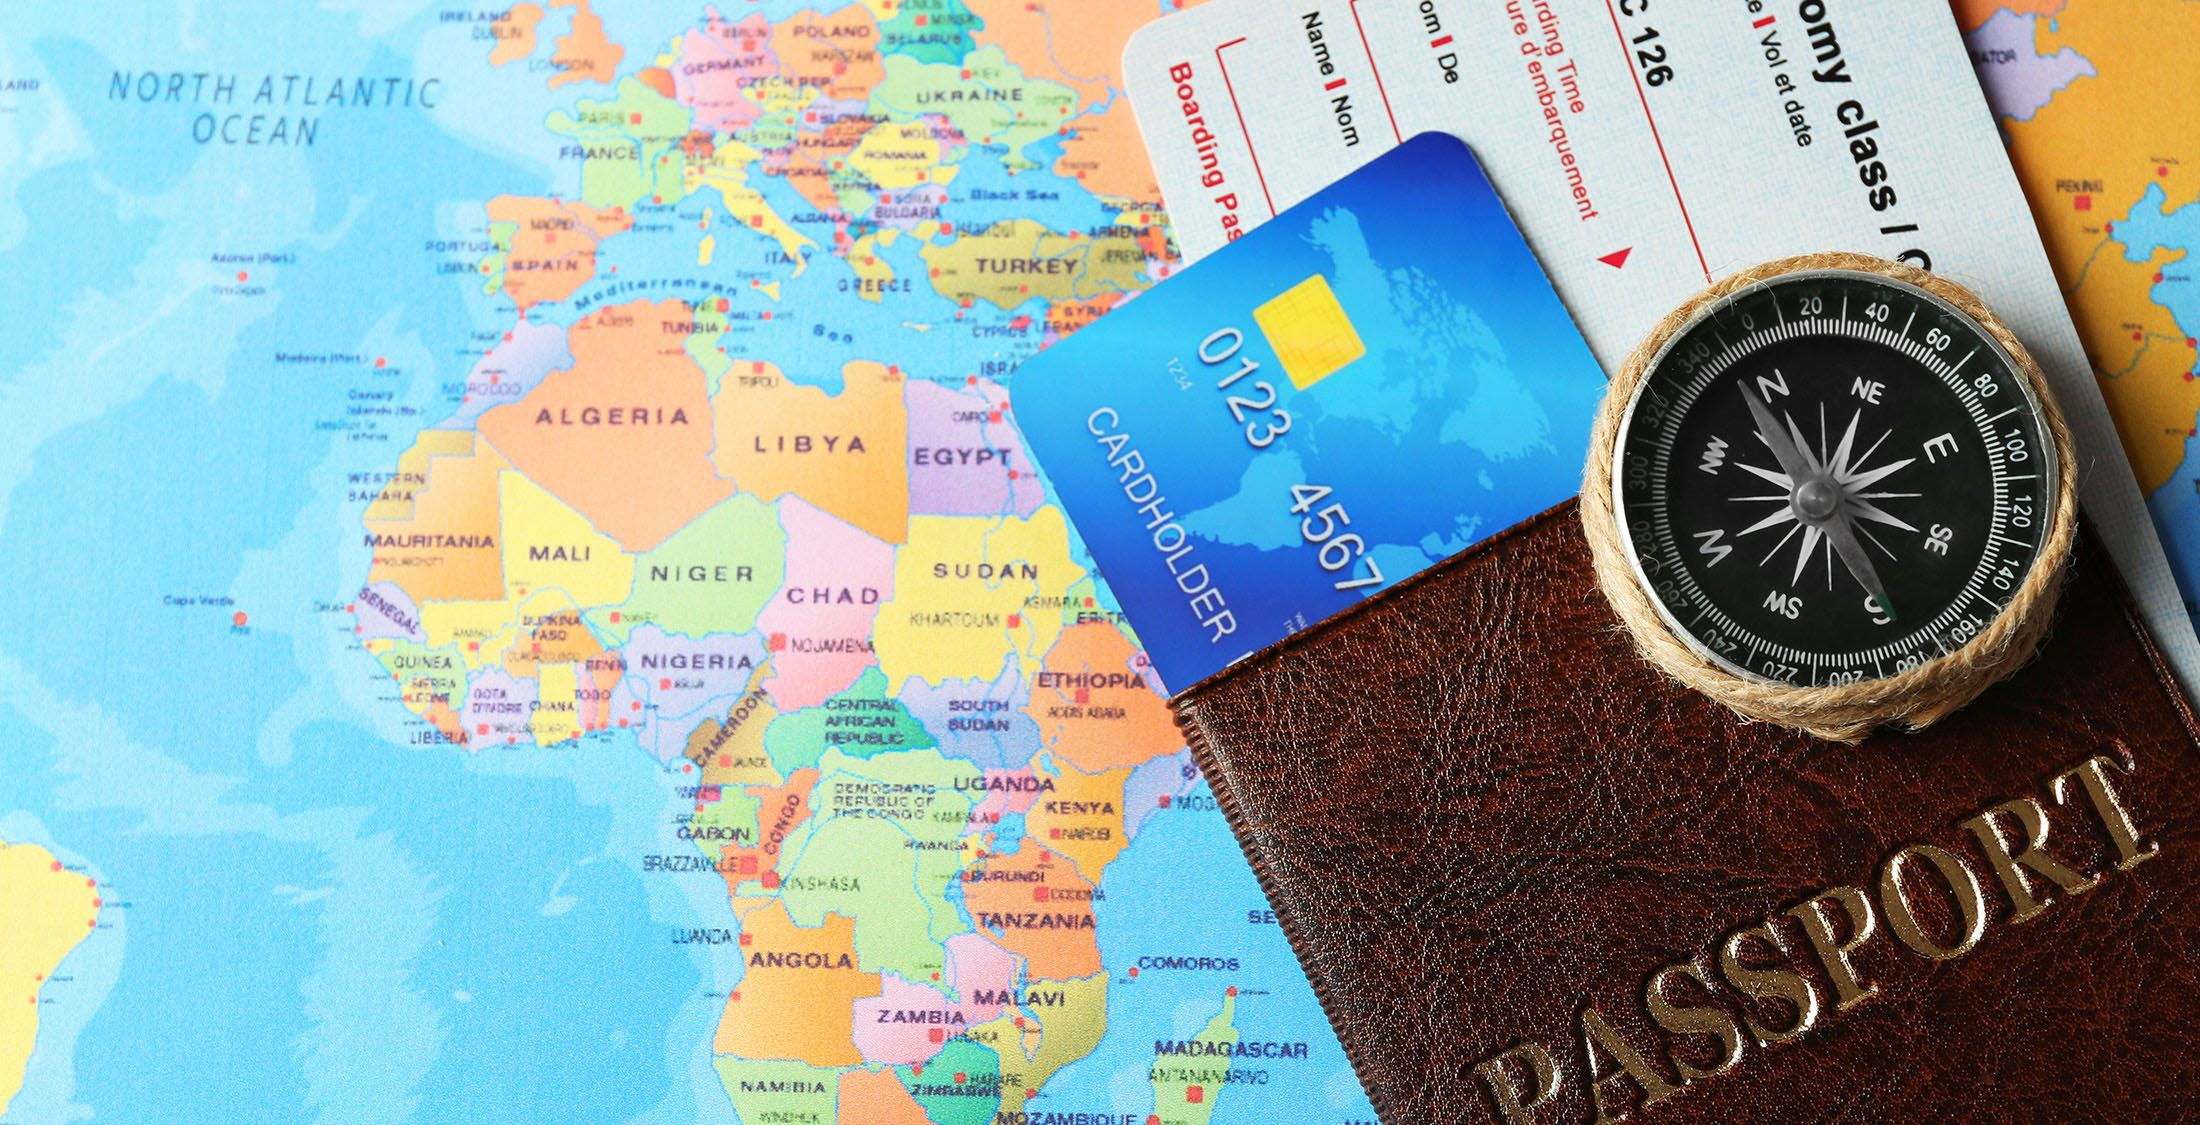 passport on top of map